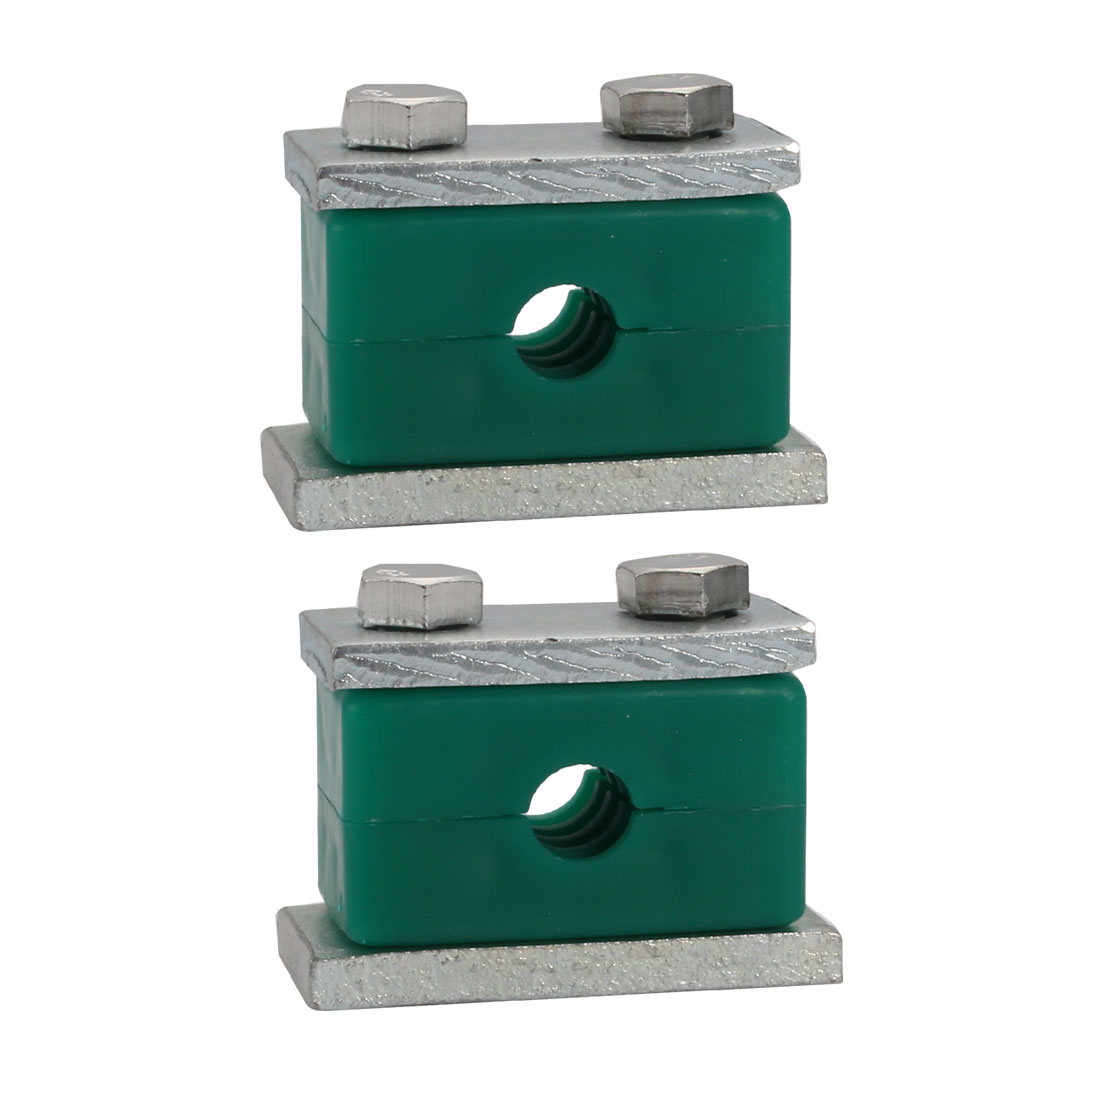 12mm Fitting Dia Polypropylene Aluminum Heavy Series Hose Pipe Tube Clamp 2pcs